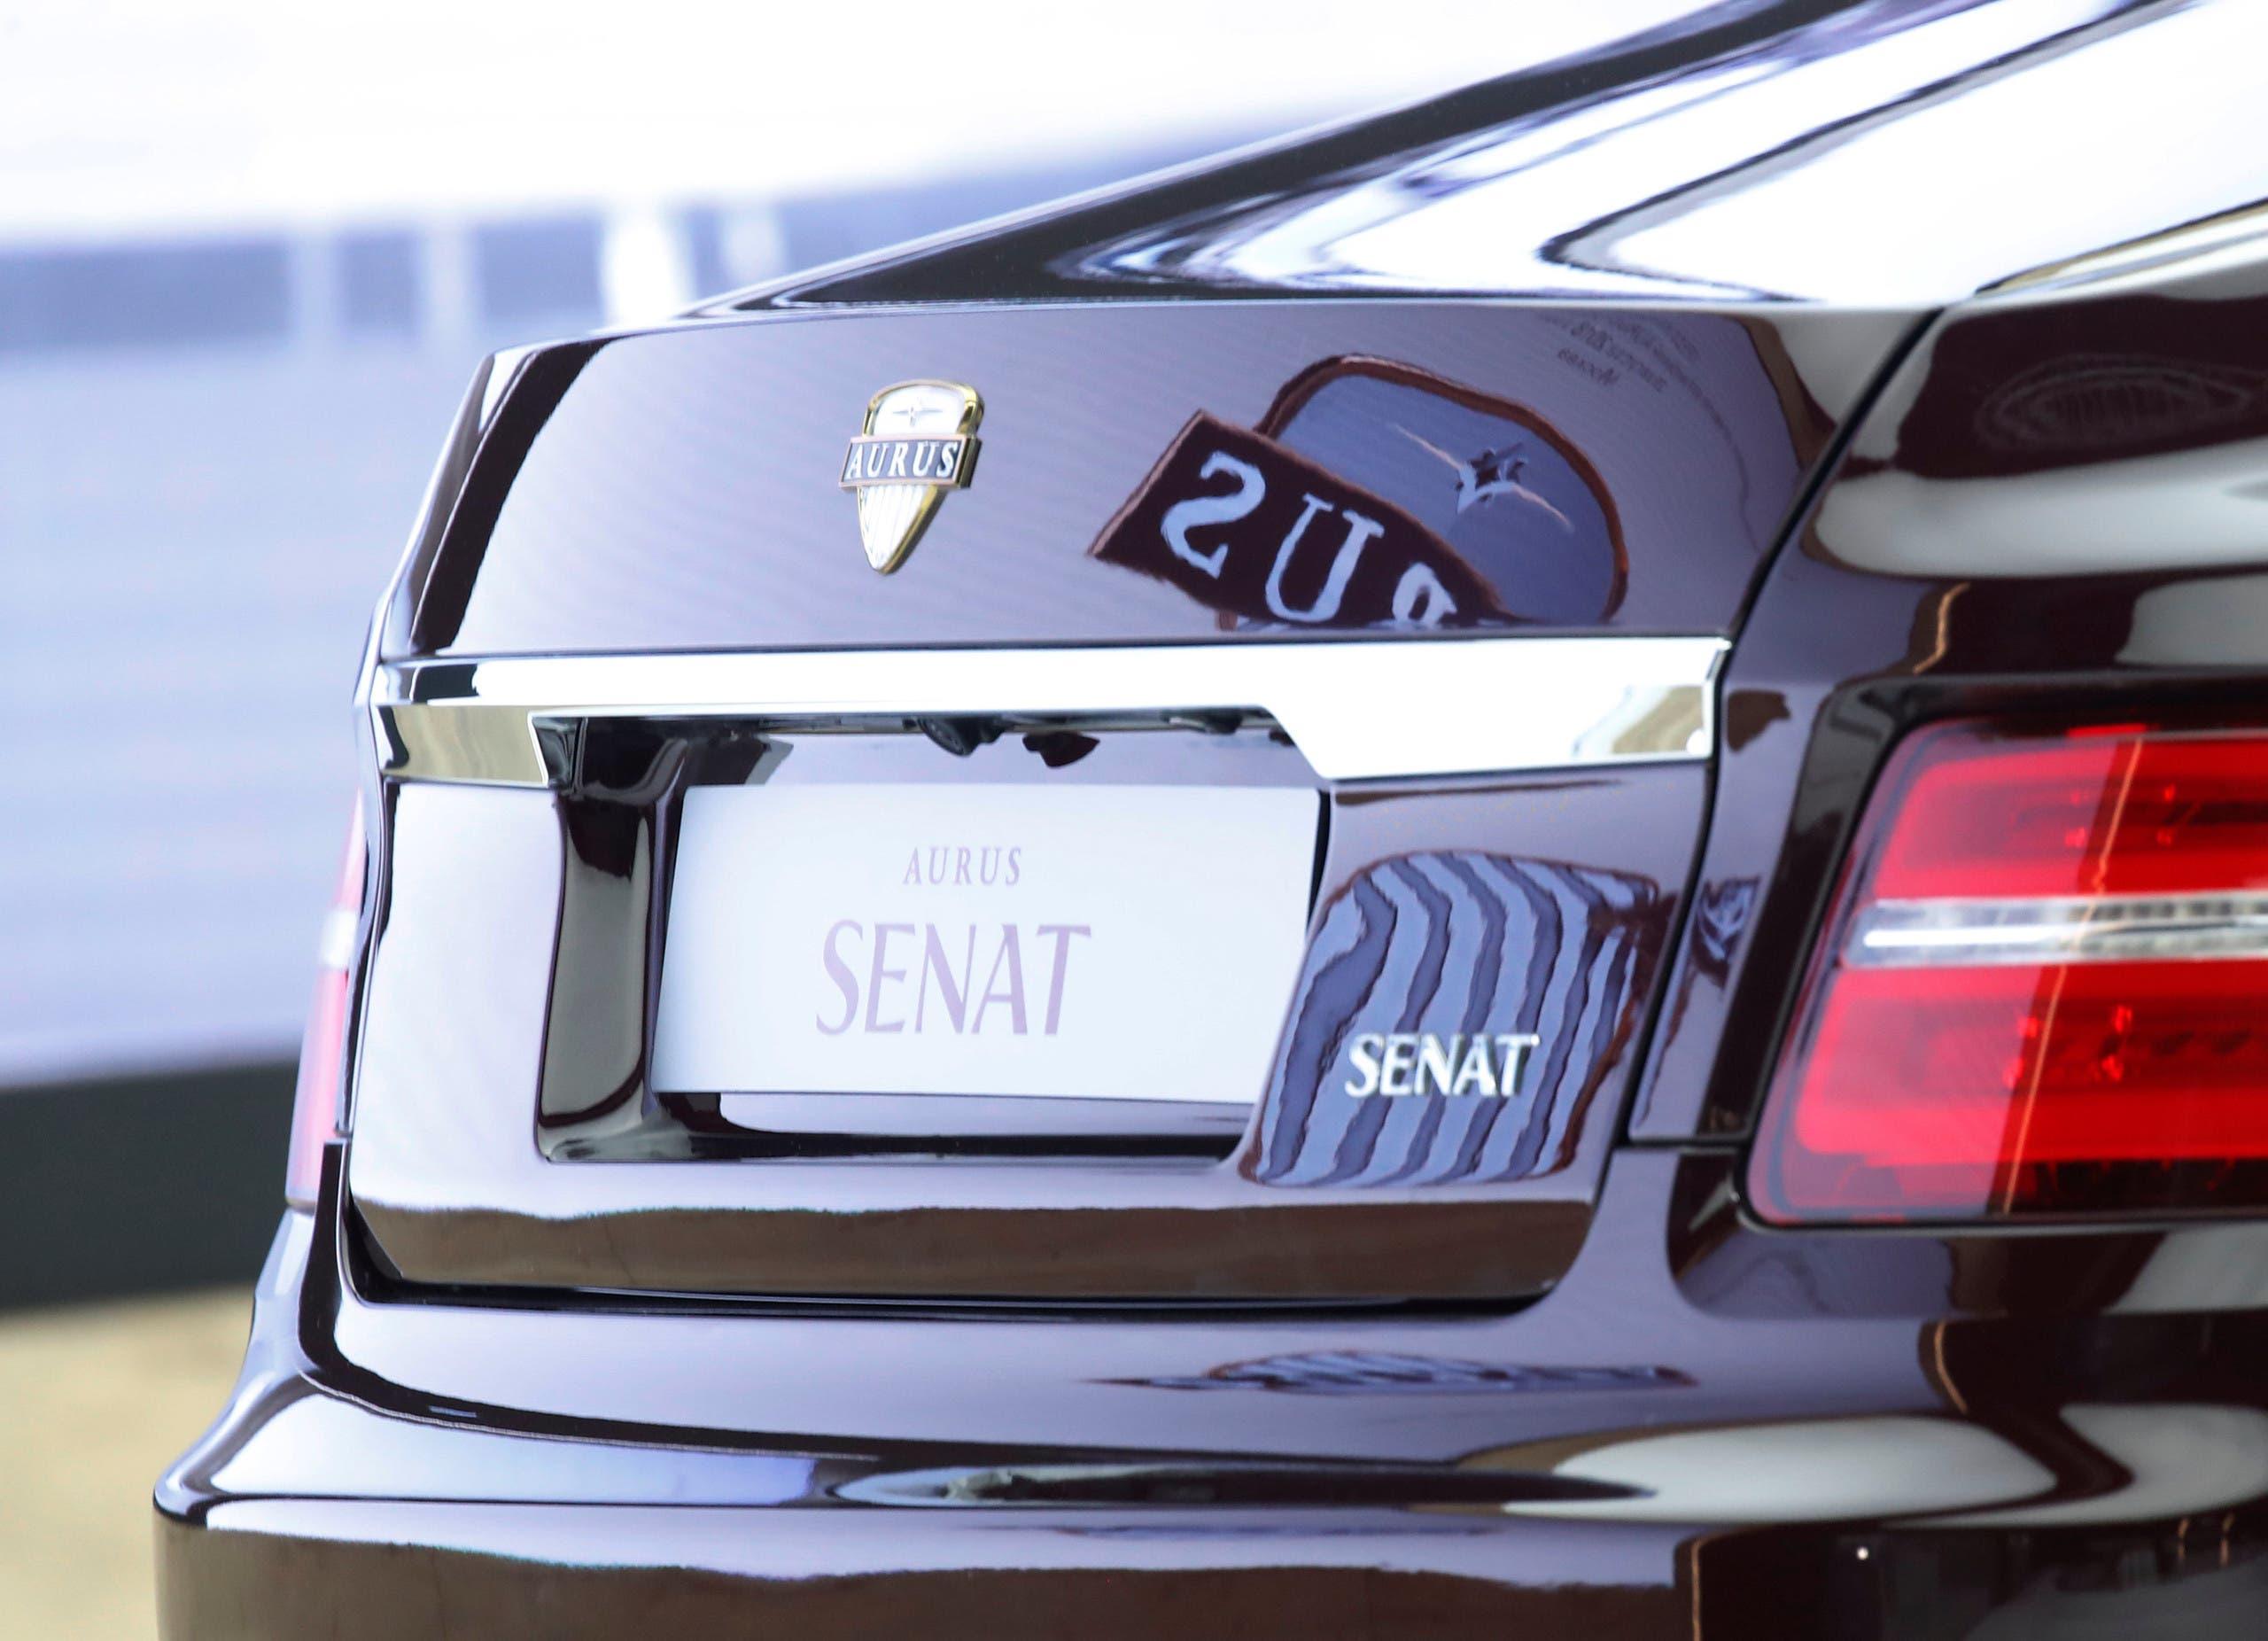 %name سيارة بوتين من الداخل ... صلابة وفخامة!